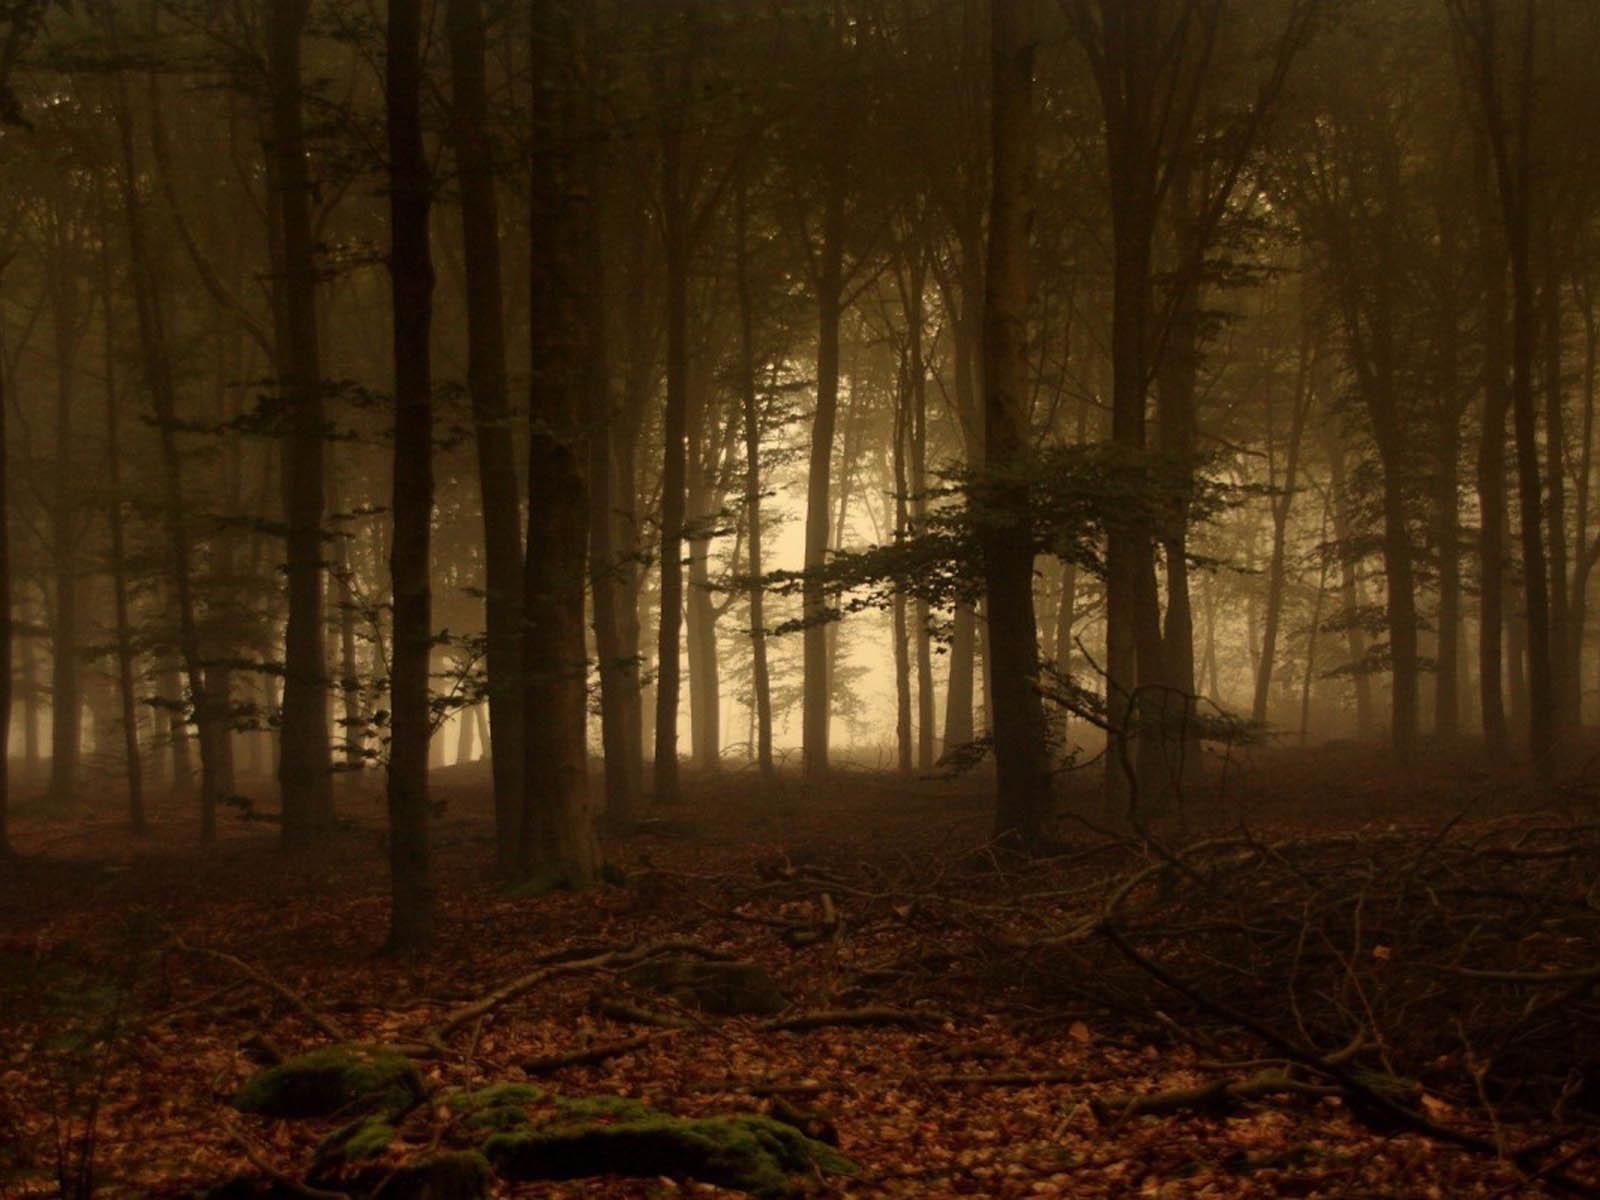 http://1.bp.blogspot.com/-YEvCntjMJnw/T_szfDVKM2I/AAAAAAAAFNQ/ef1z-hIsTvY/s1600/Twilight+Forest+Wallpapers.jpg